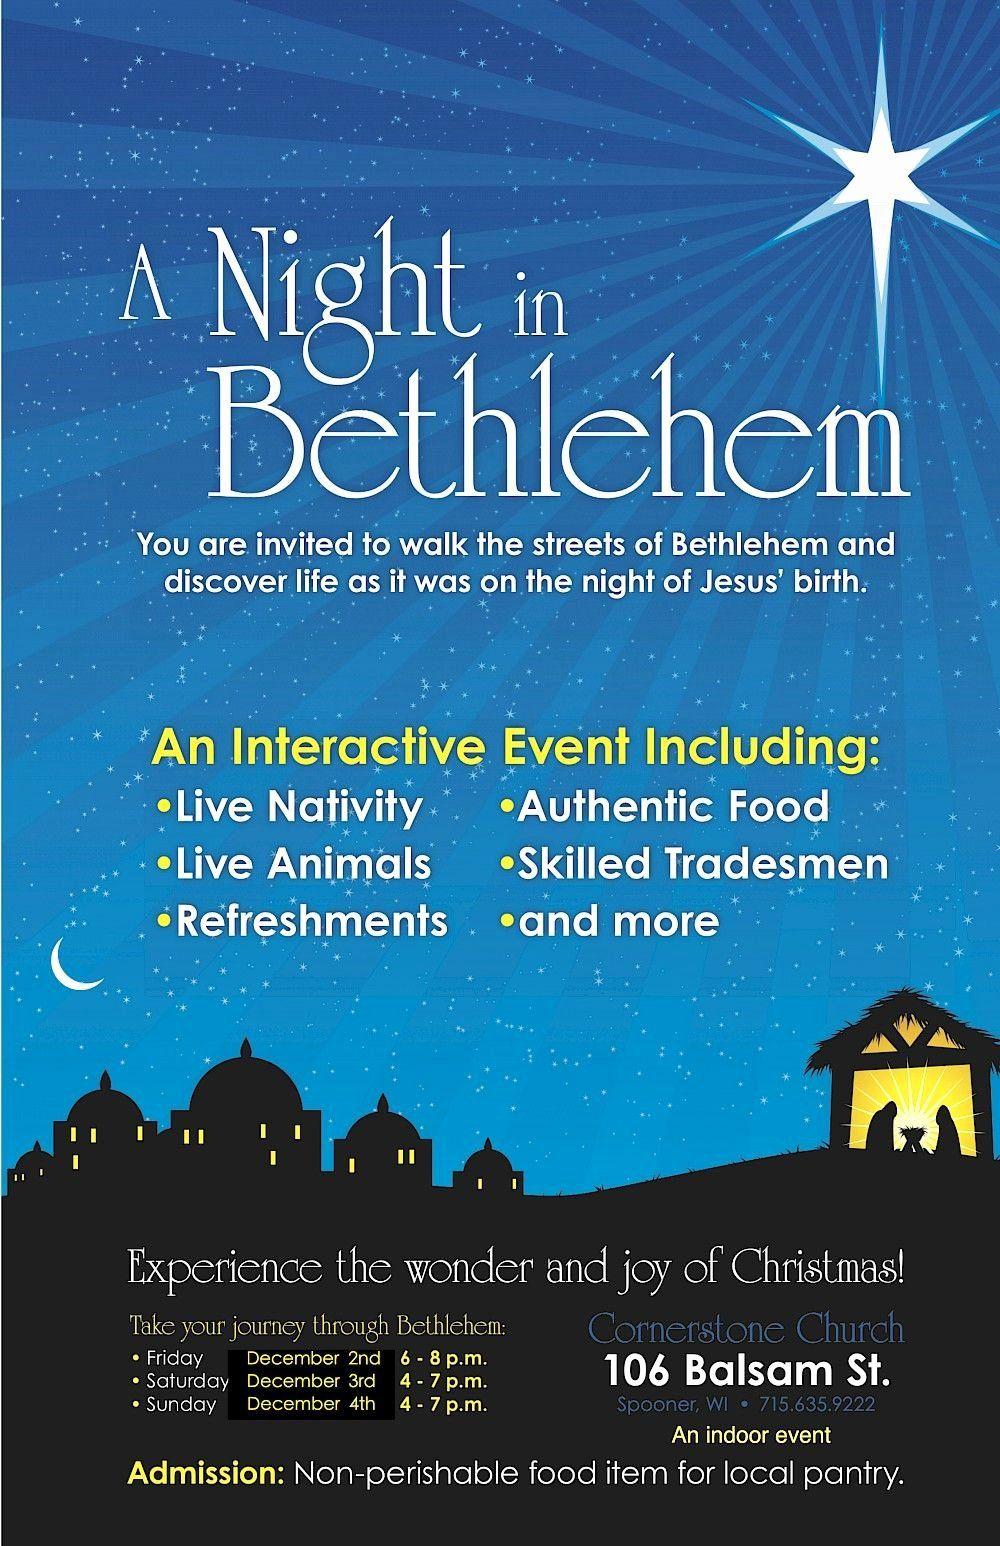 Cornerstone Church Spooner Wi Christmas Walk 2020 A Night In Bethlehem Invitation Unique Cornerstone Church Hosting